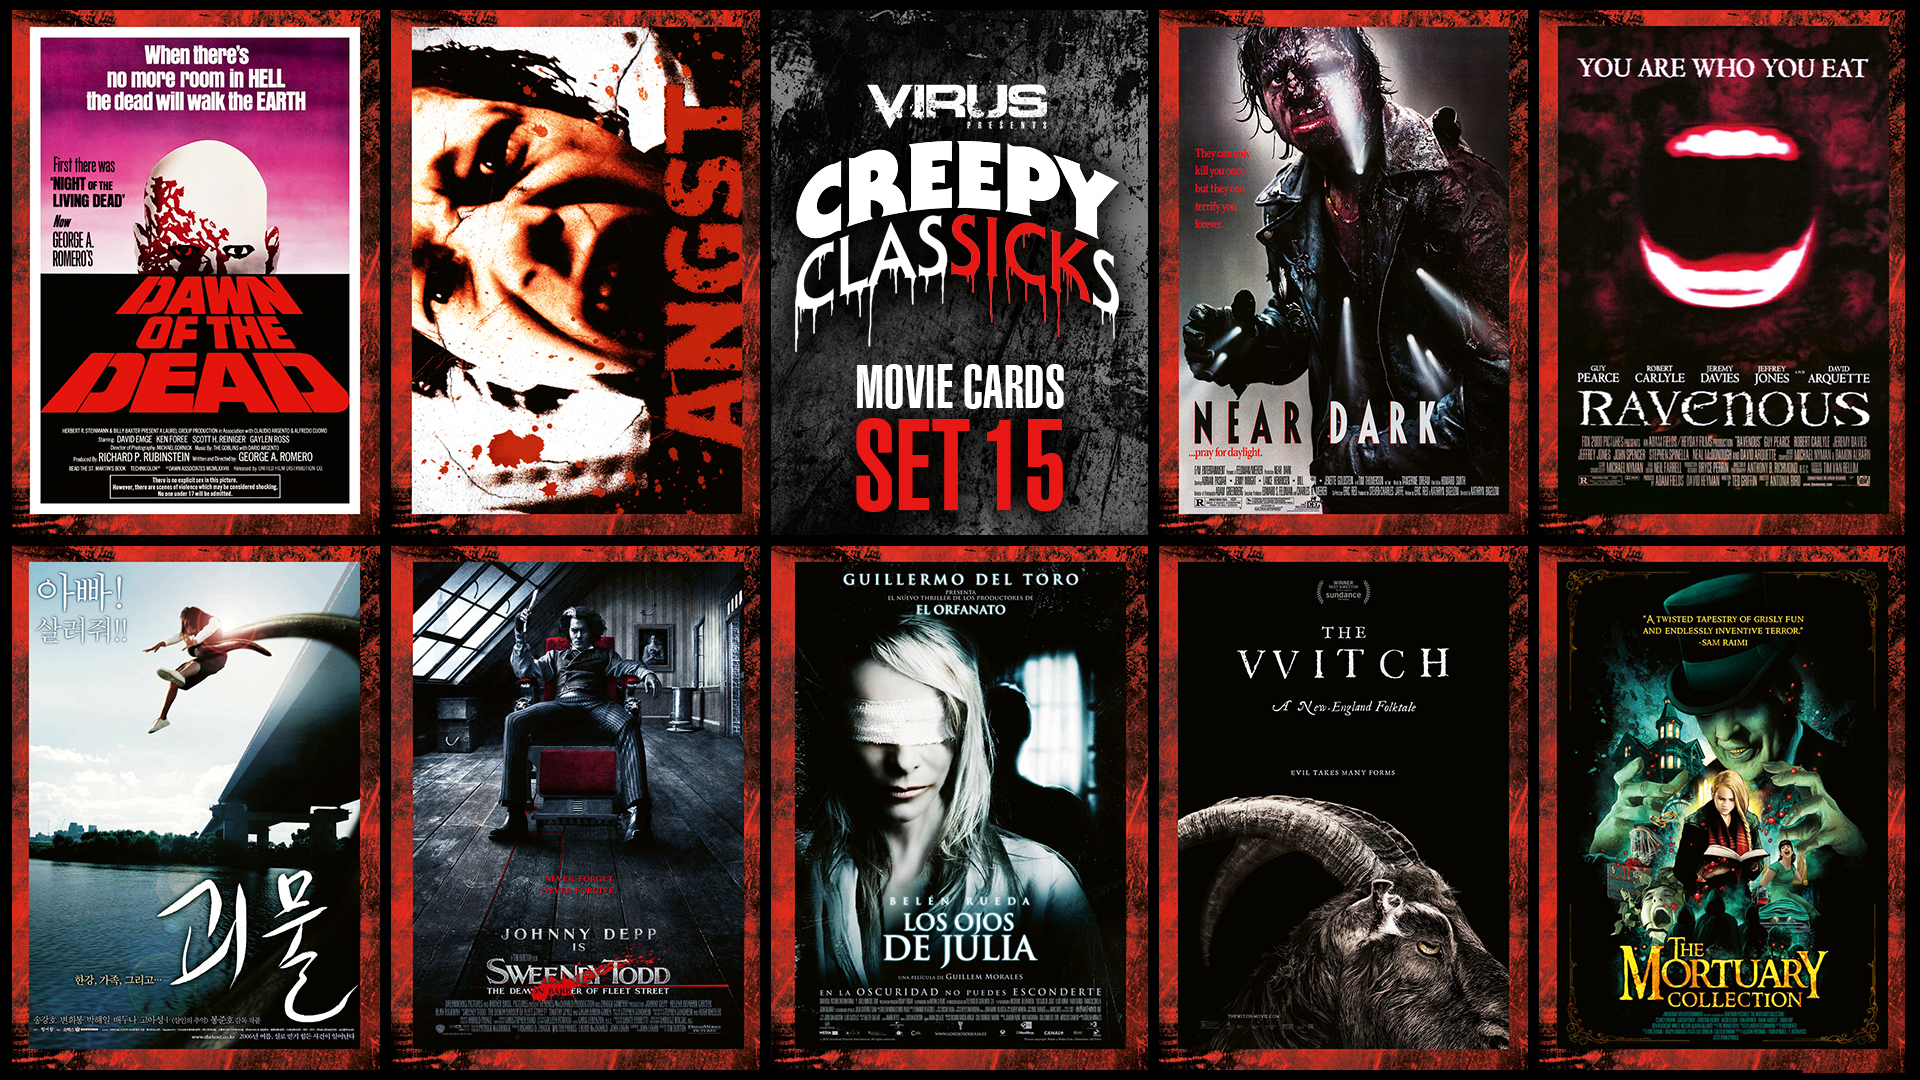 VIRUS Creepy ClasSICKs Movie Cards Set #15